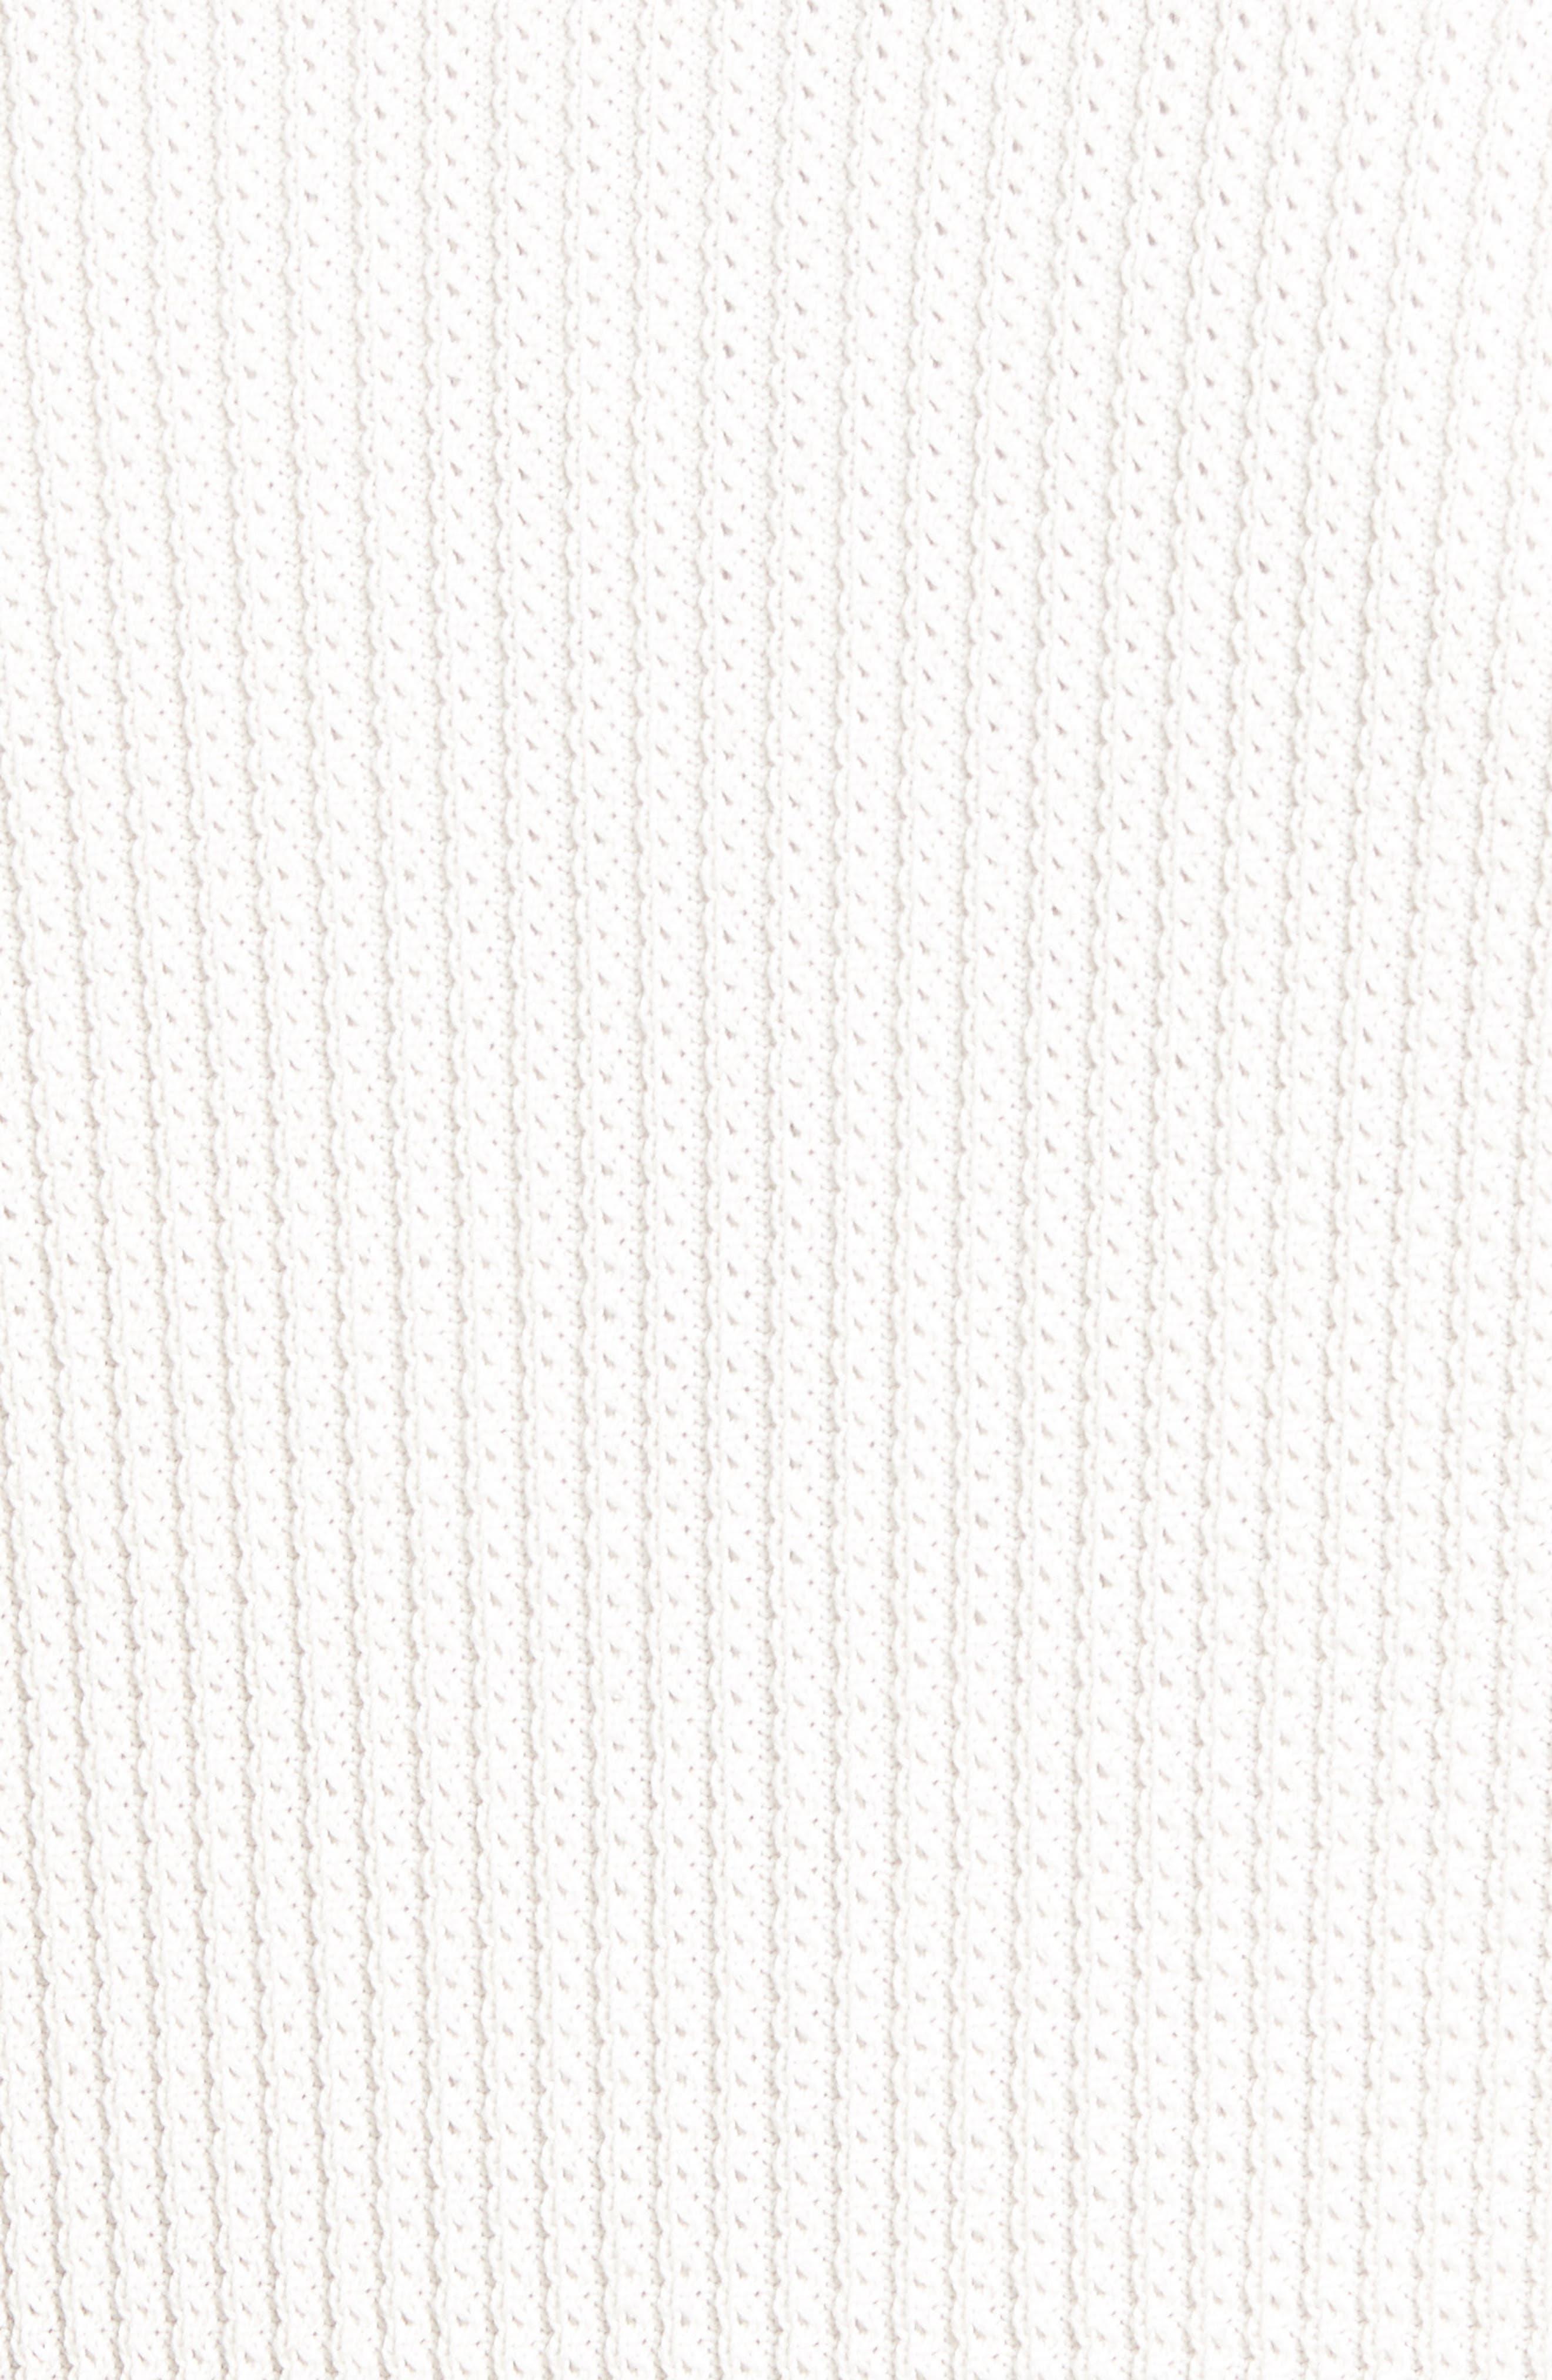 Slim Fit Thermal Knit Raglan Sweater,                             Alternate thumbnail 5, color,                             100